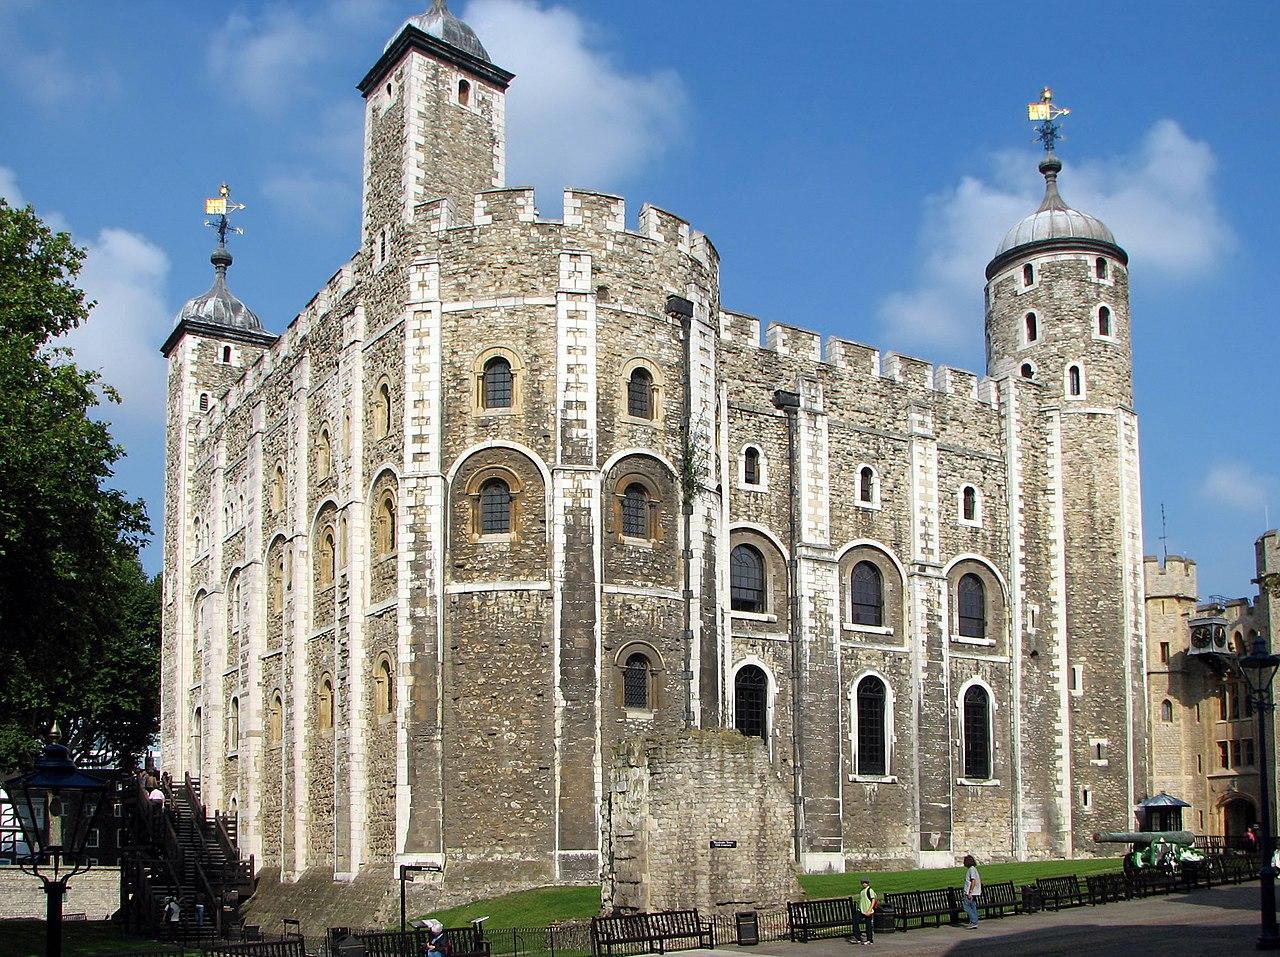 Copyright Bernard Gagnon, Tower of London